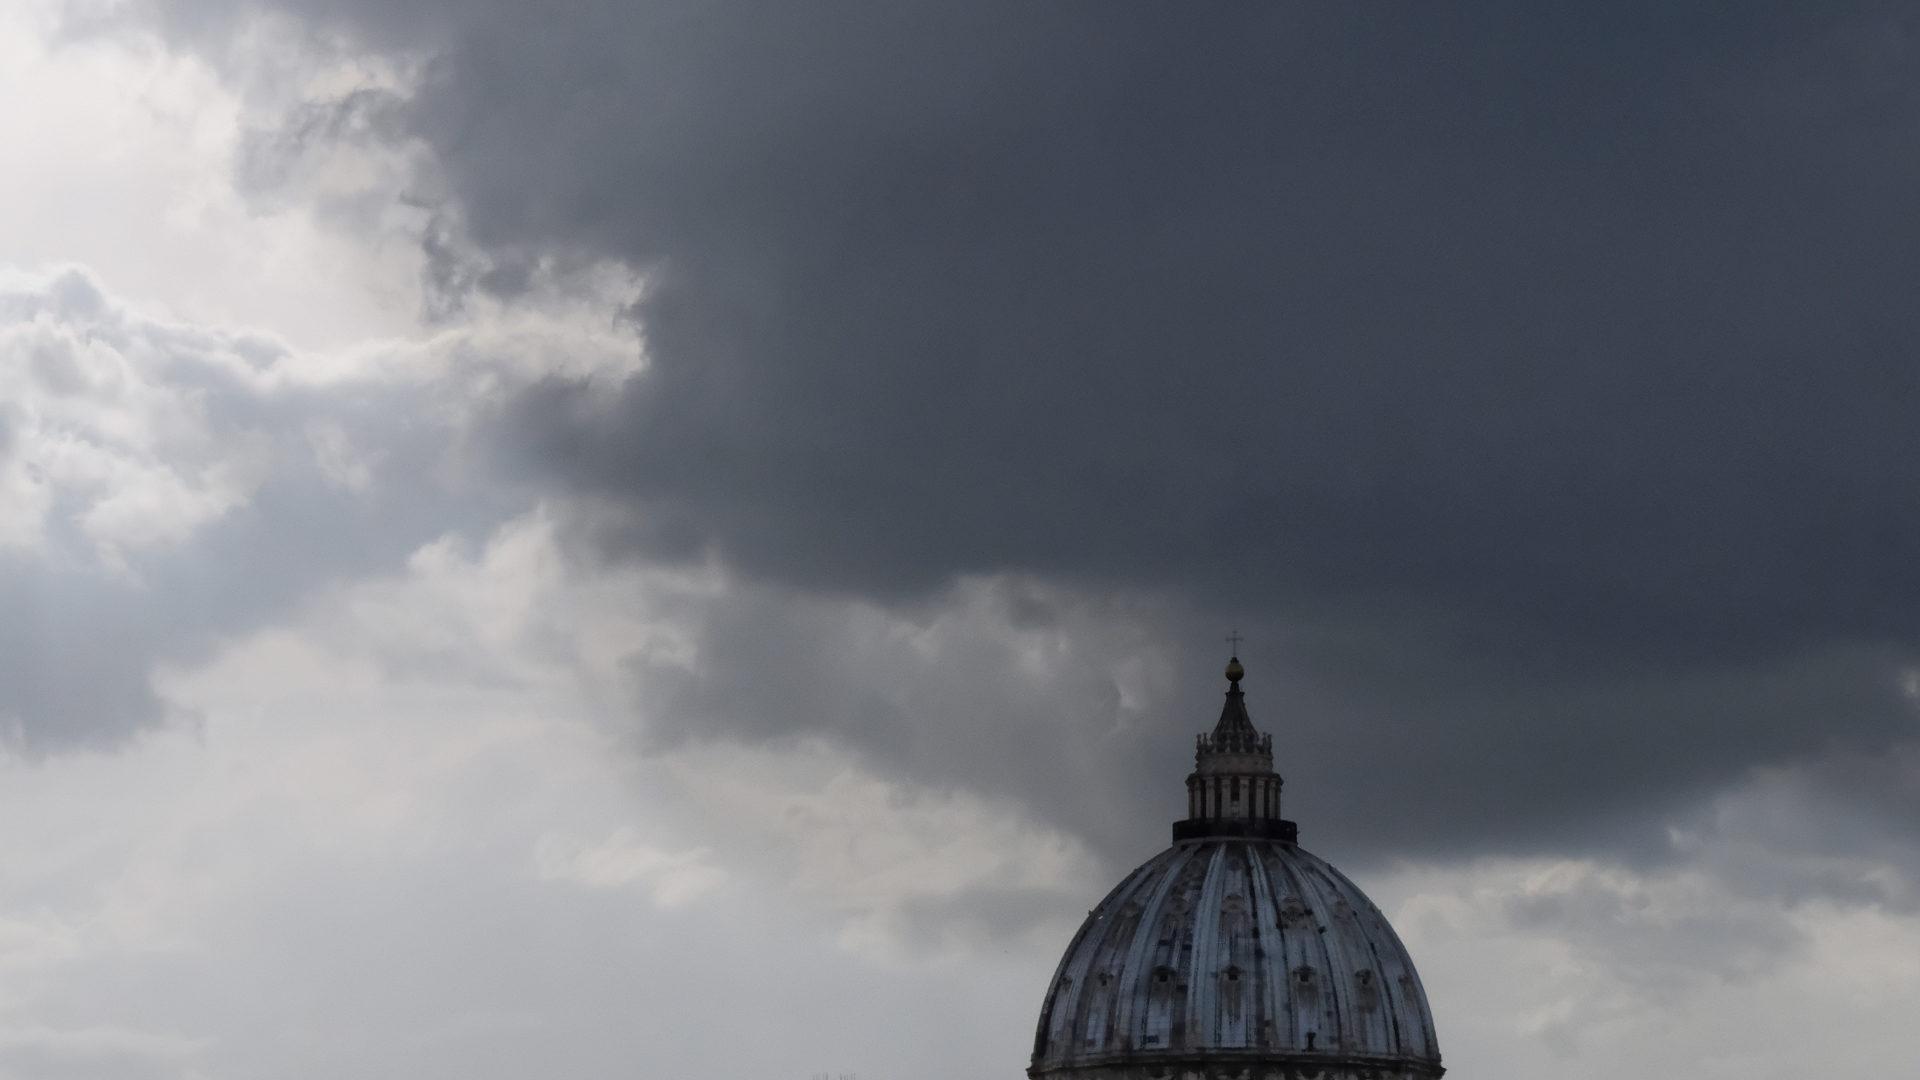 Vatikan geht Missbrauchsvorwürfen gegen Kurienbischof nach